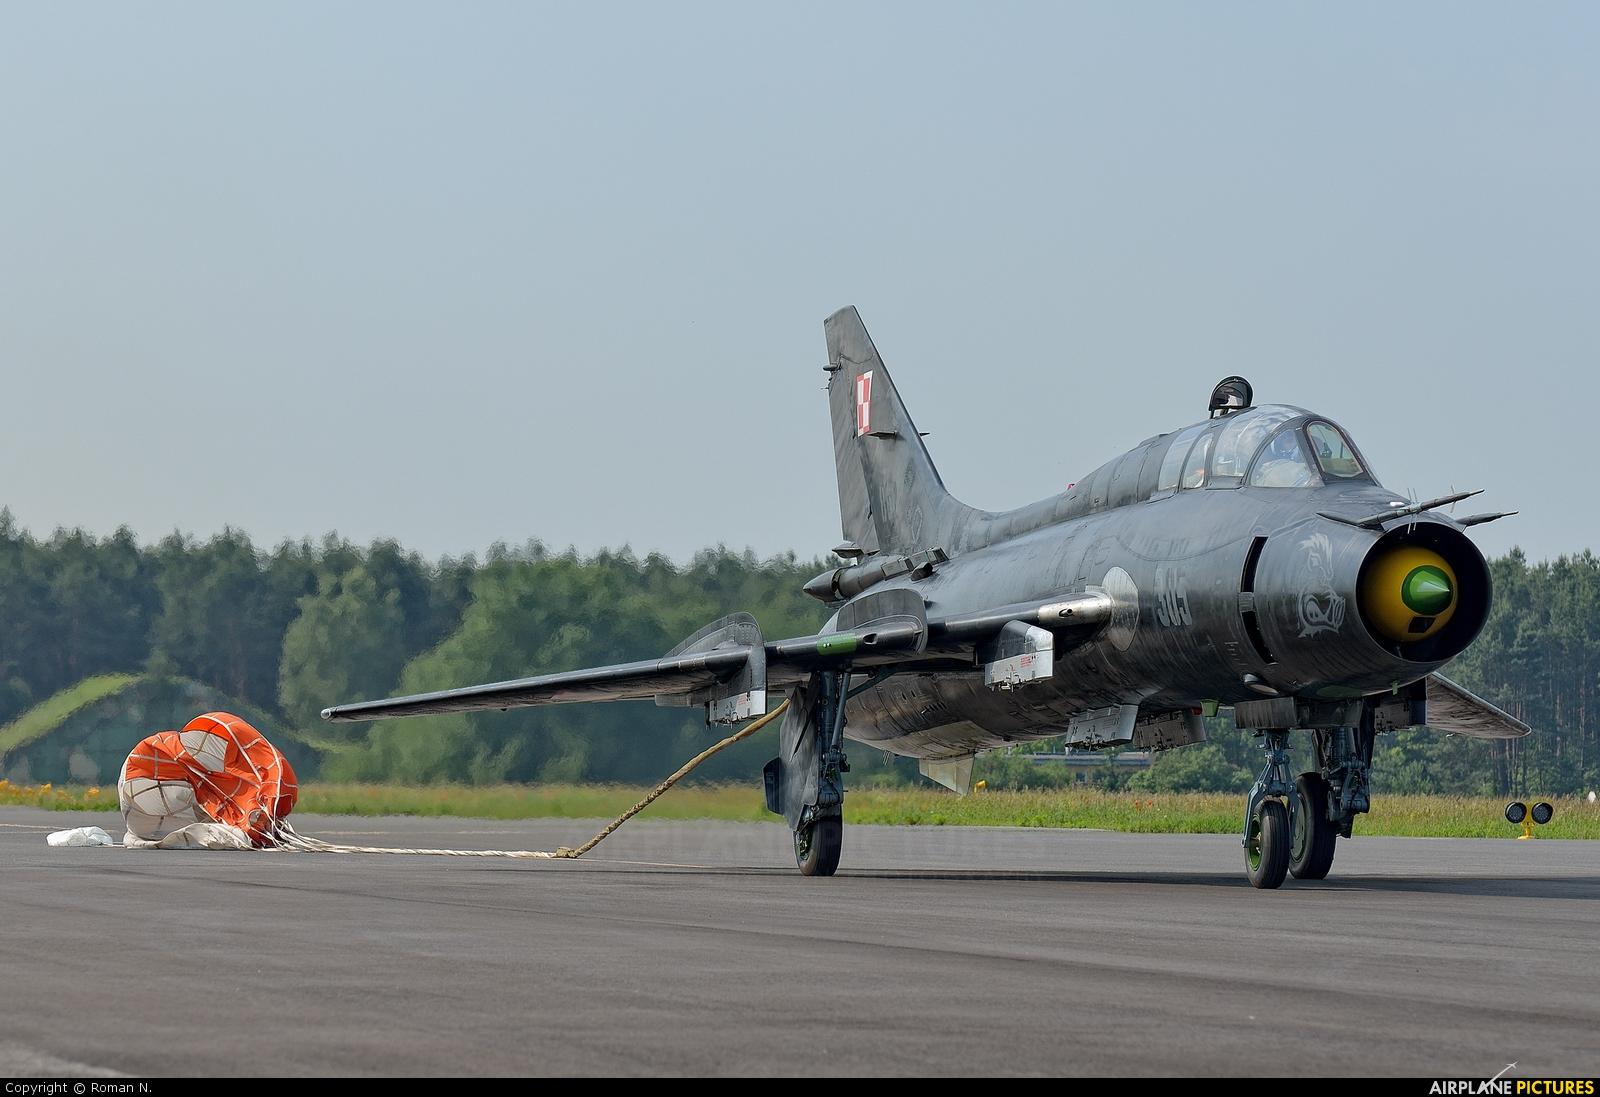 Poland - Air Force 305 aircraft at Bydgoszcz - Szwederowo